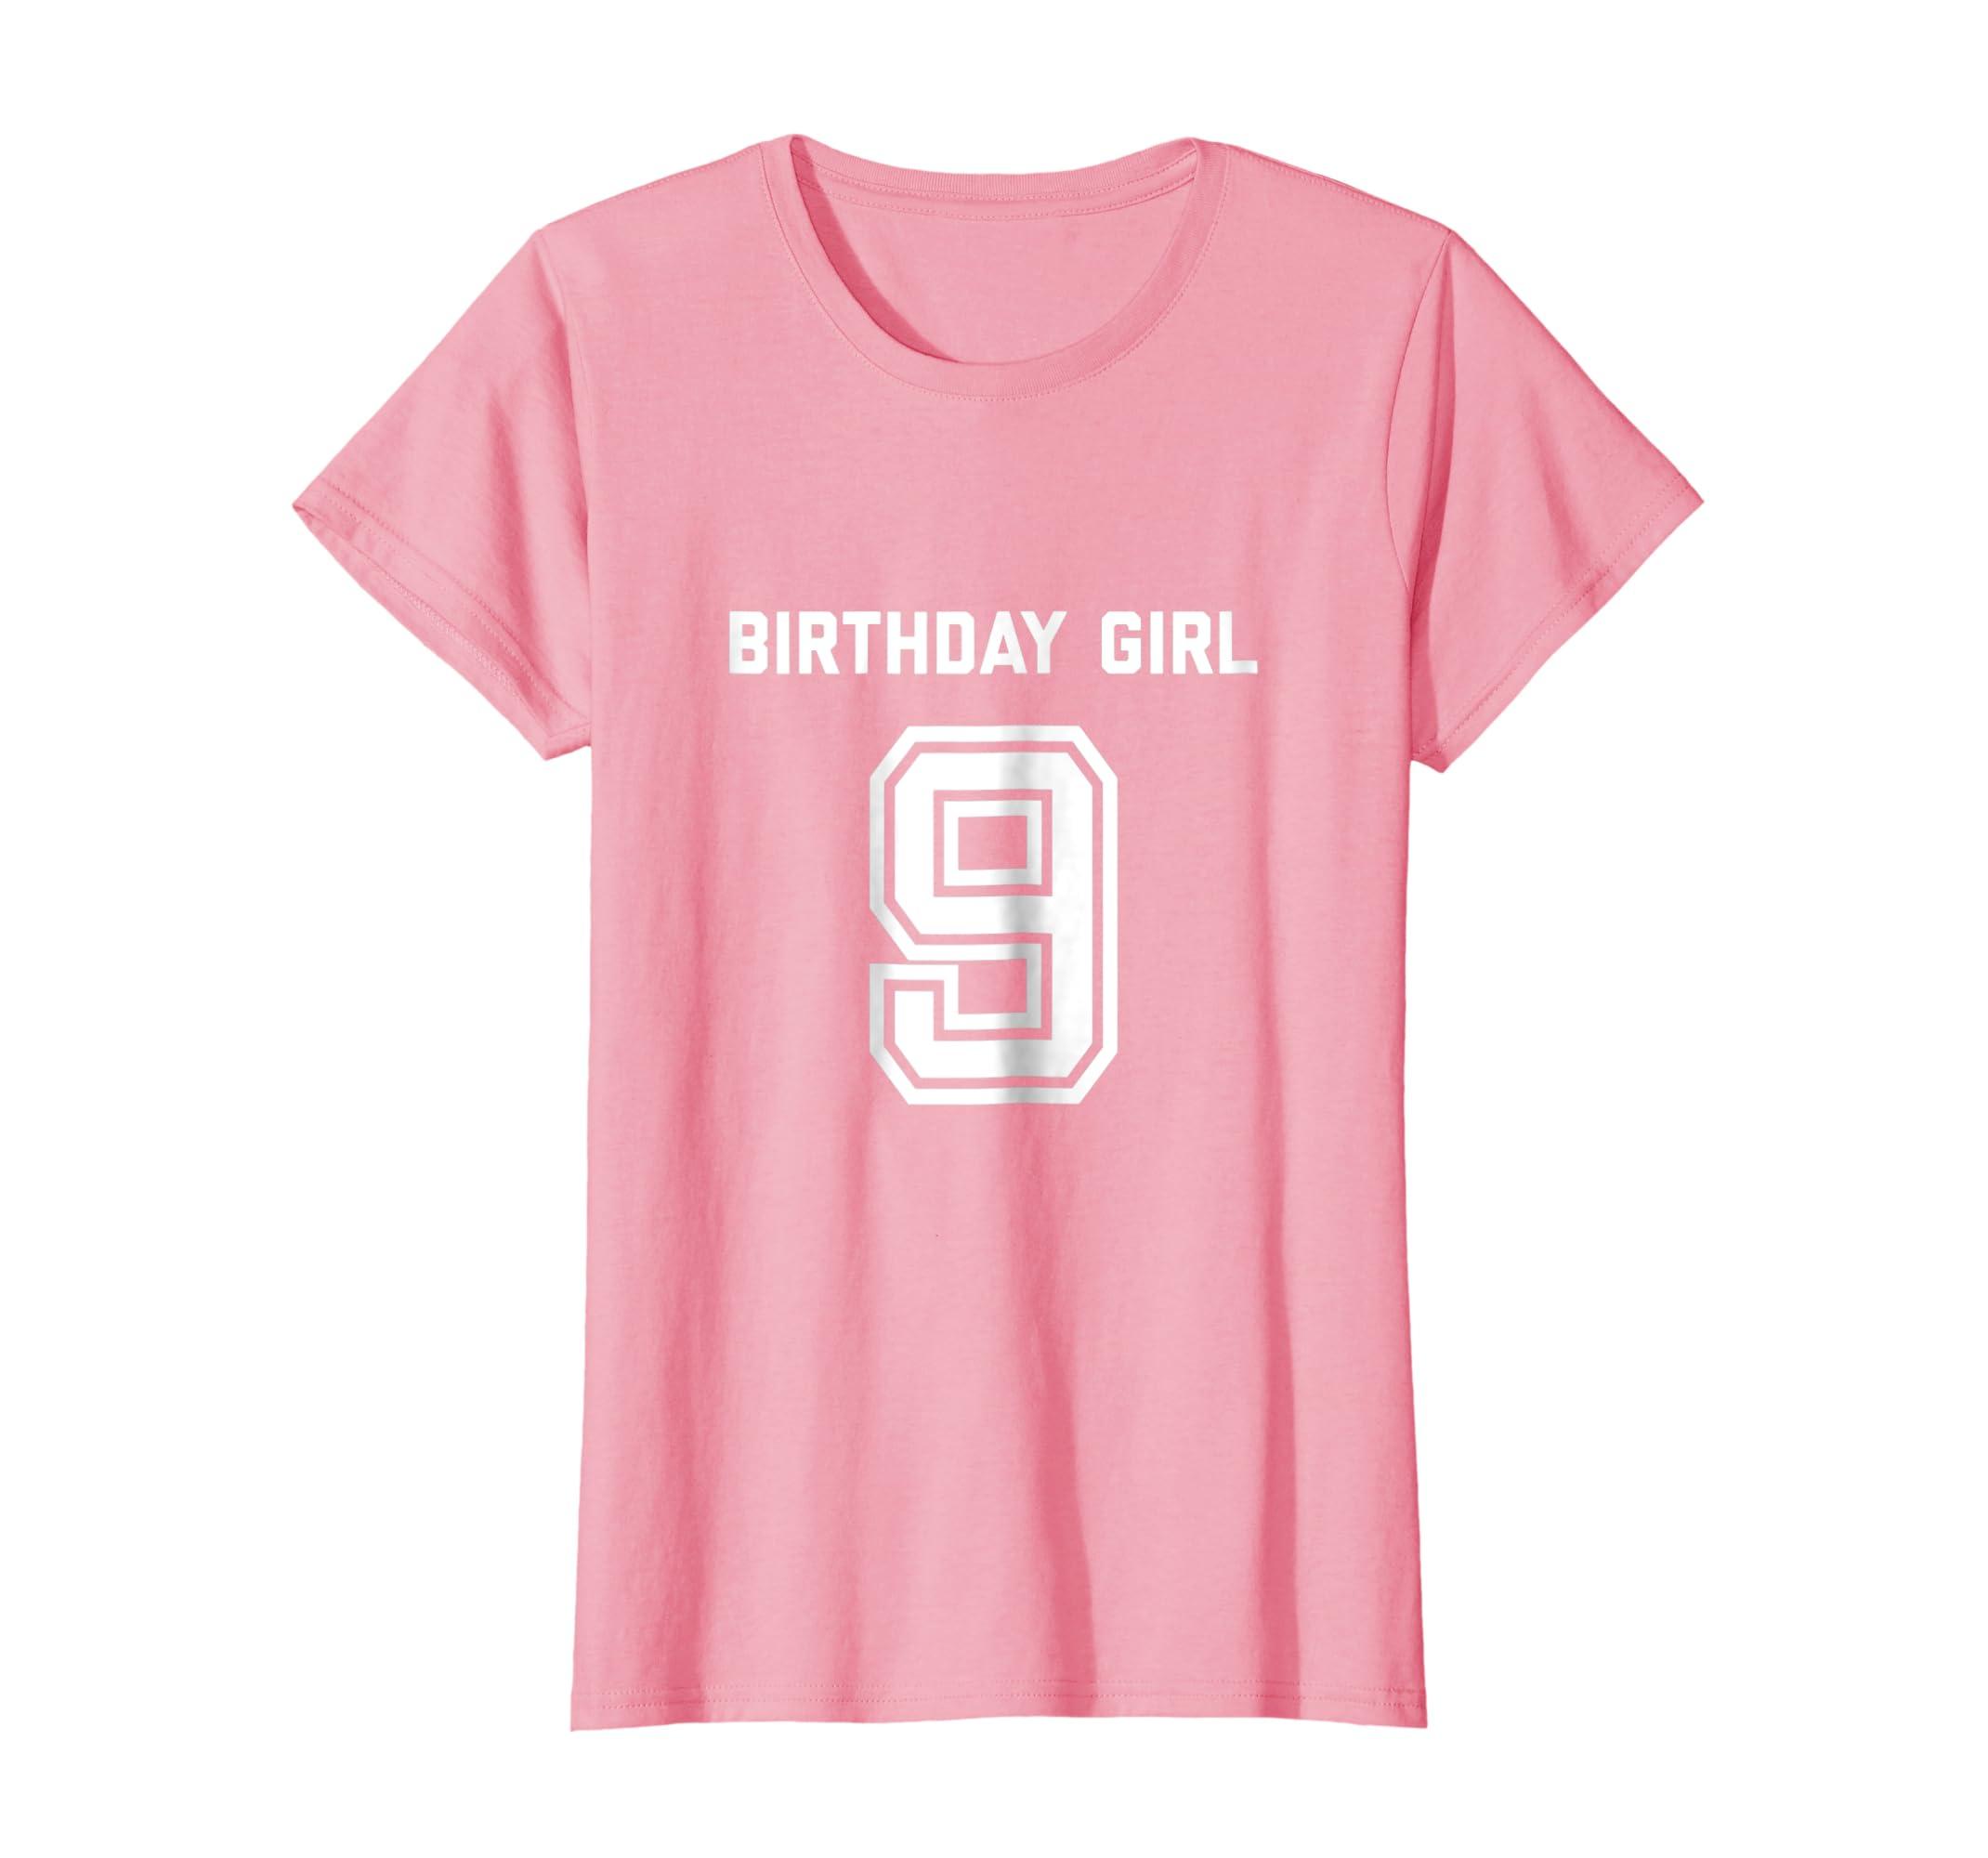 Amazon 9th Birthday Shirt Gift Age 9 Year Old Girl Tshirt Girls Tee Clothing